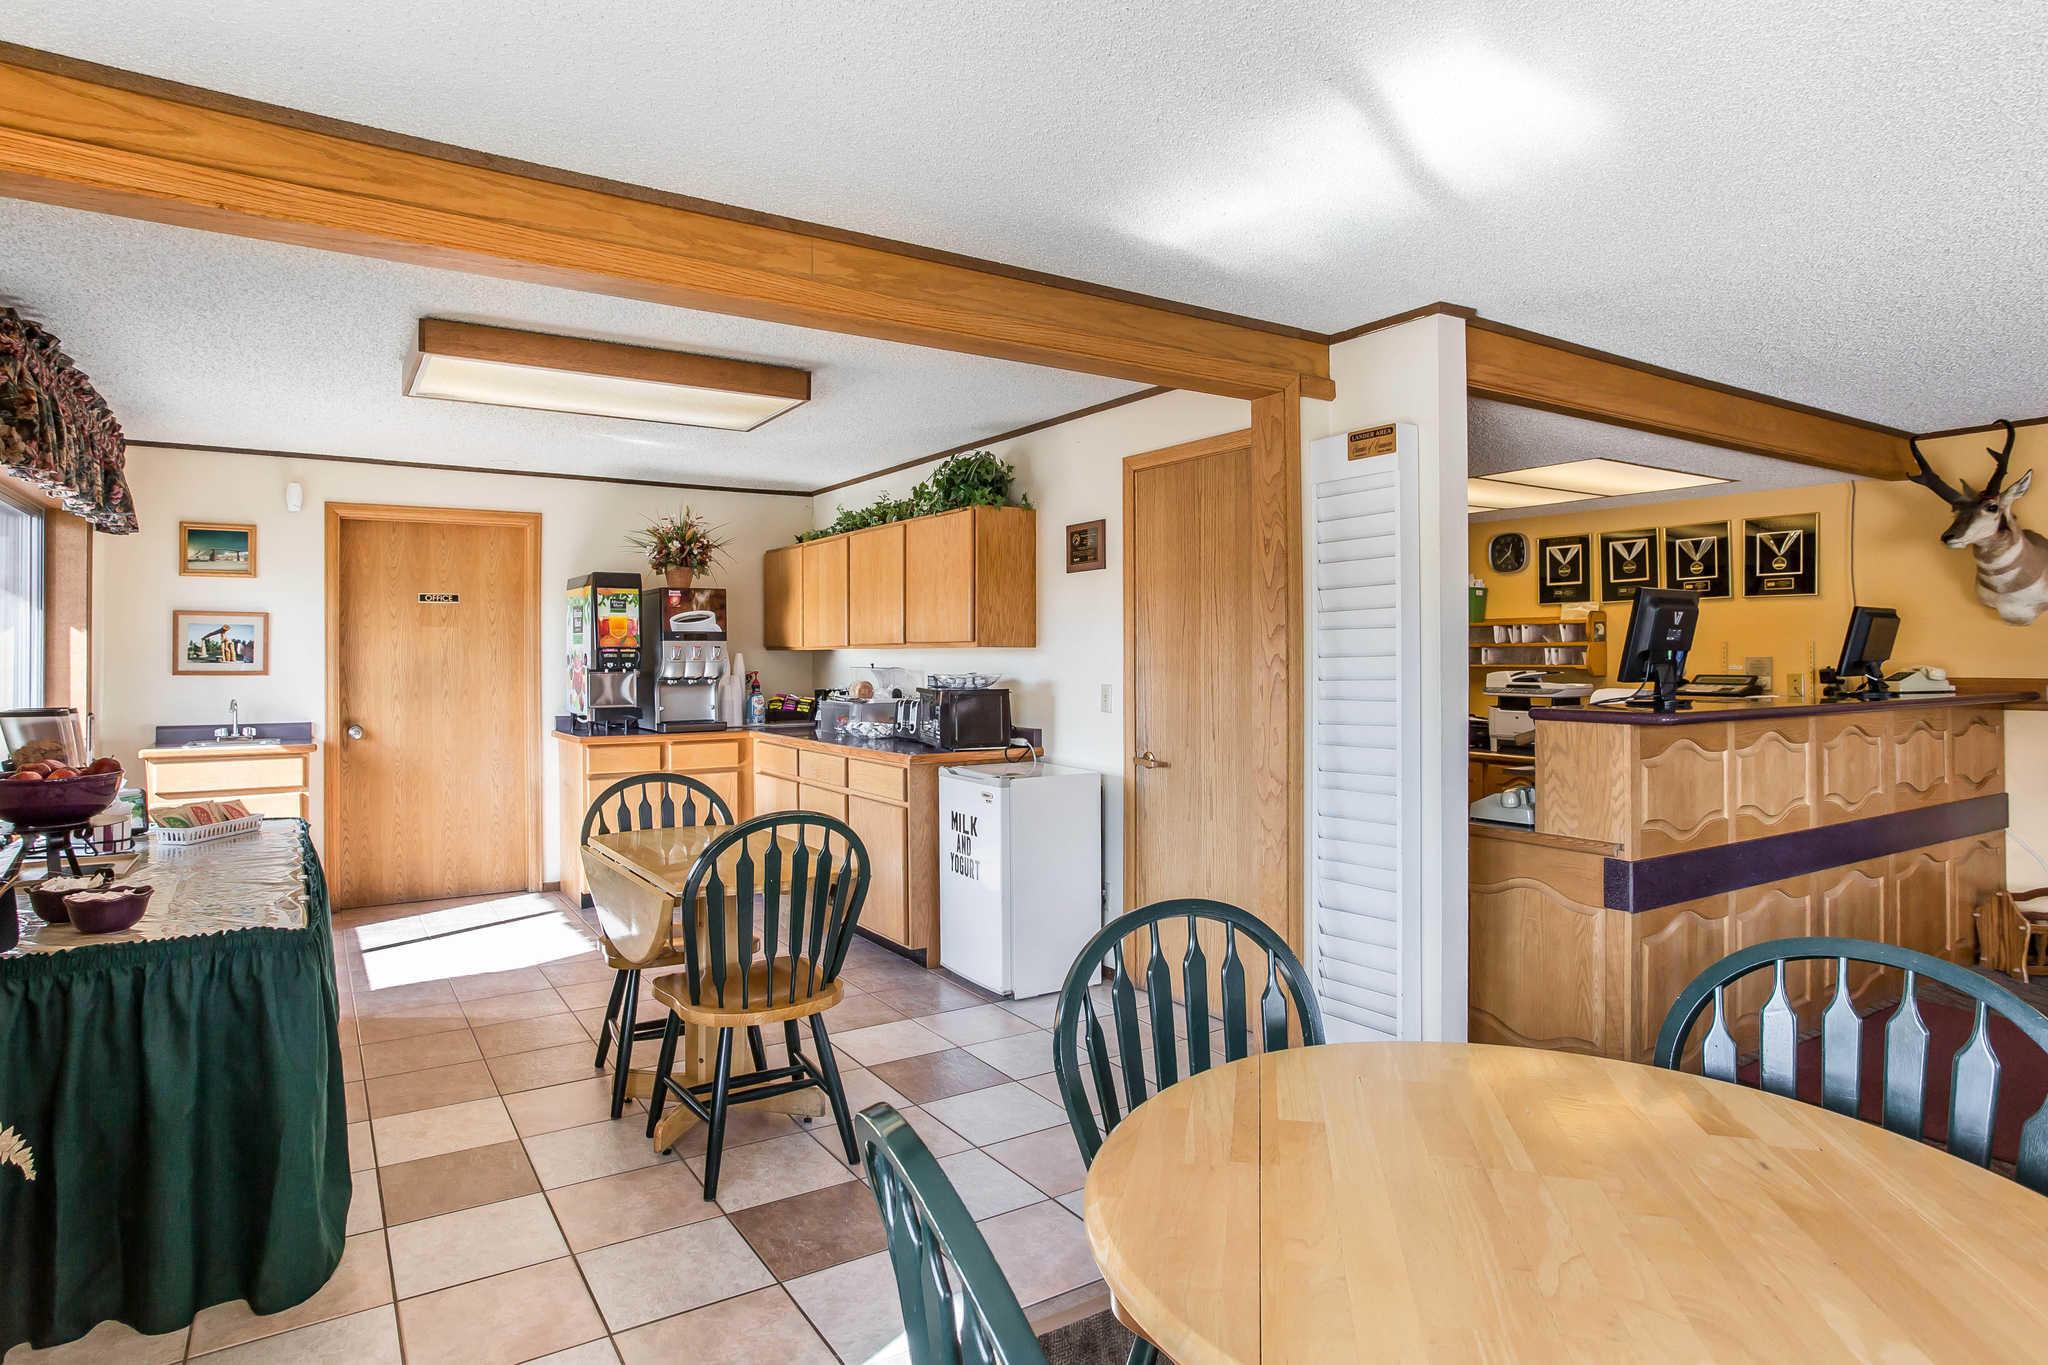 Rodeway Inn Pronghorn Lodge image 6